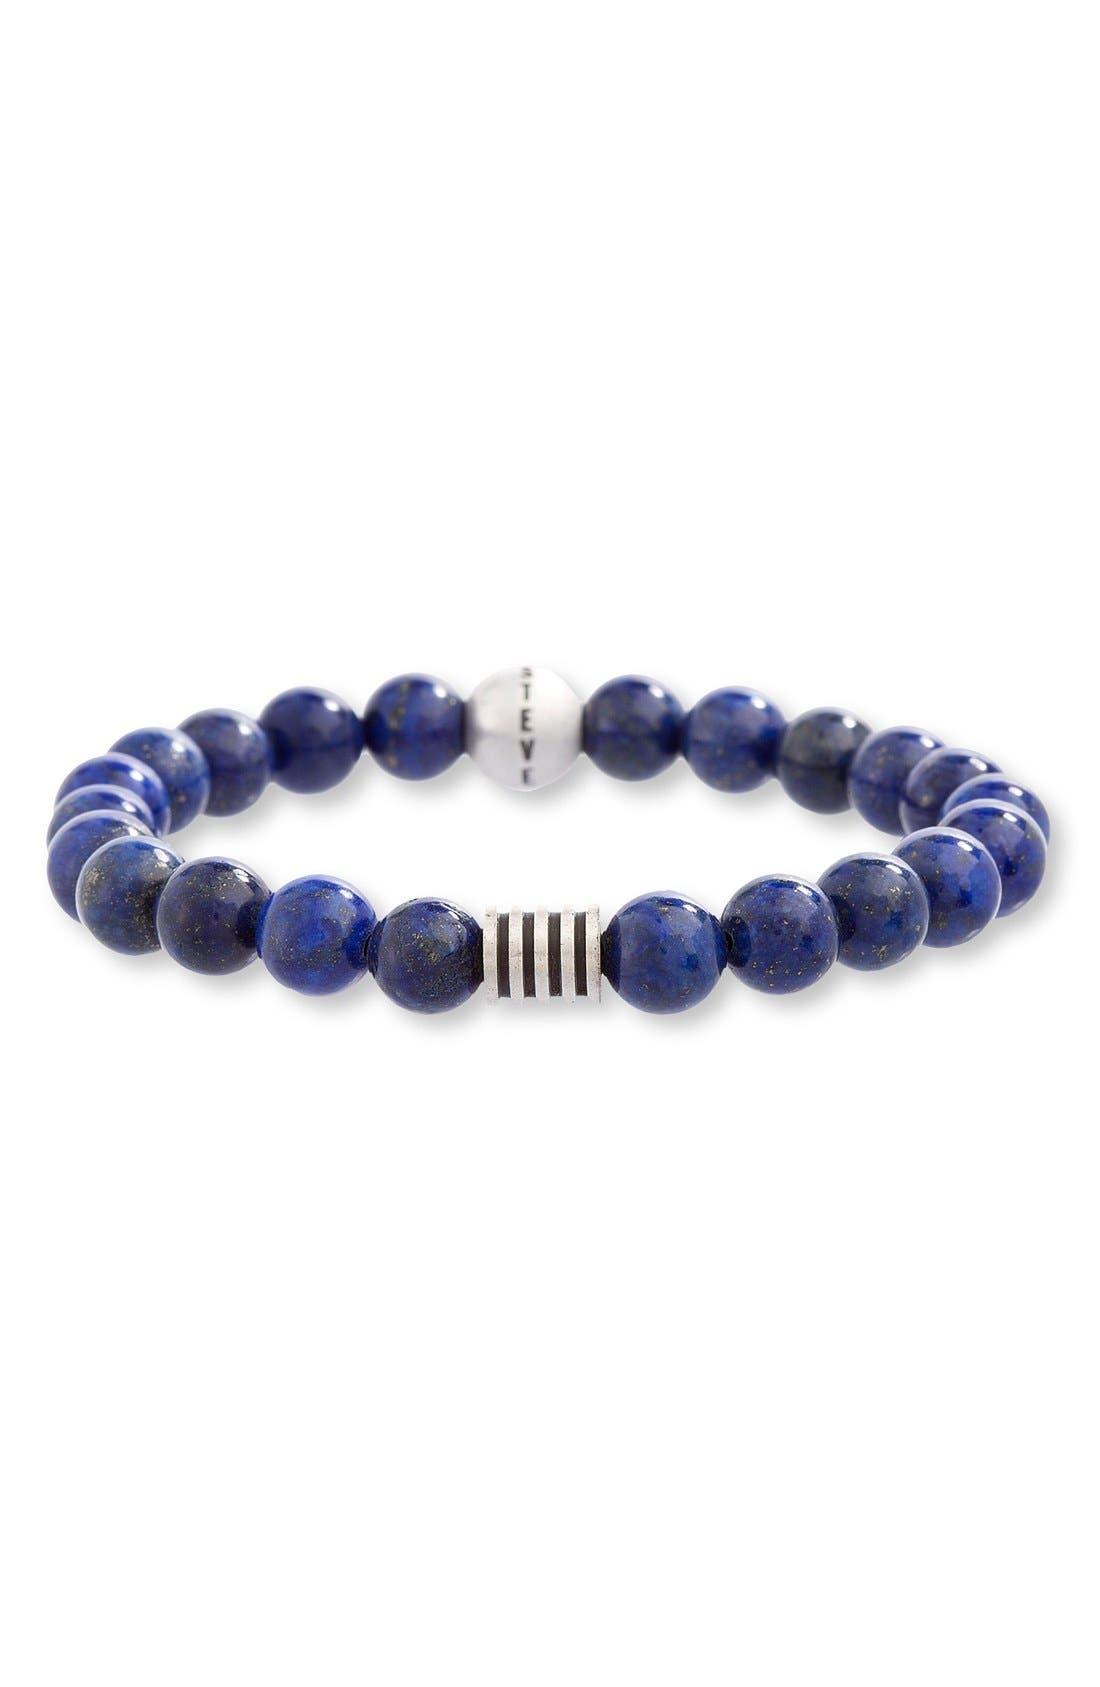 Main Image - Steve Madden Lapis Lazuli Bead Bracelet